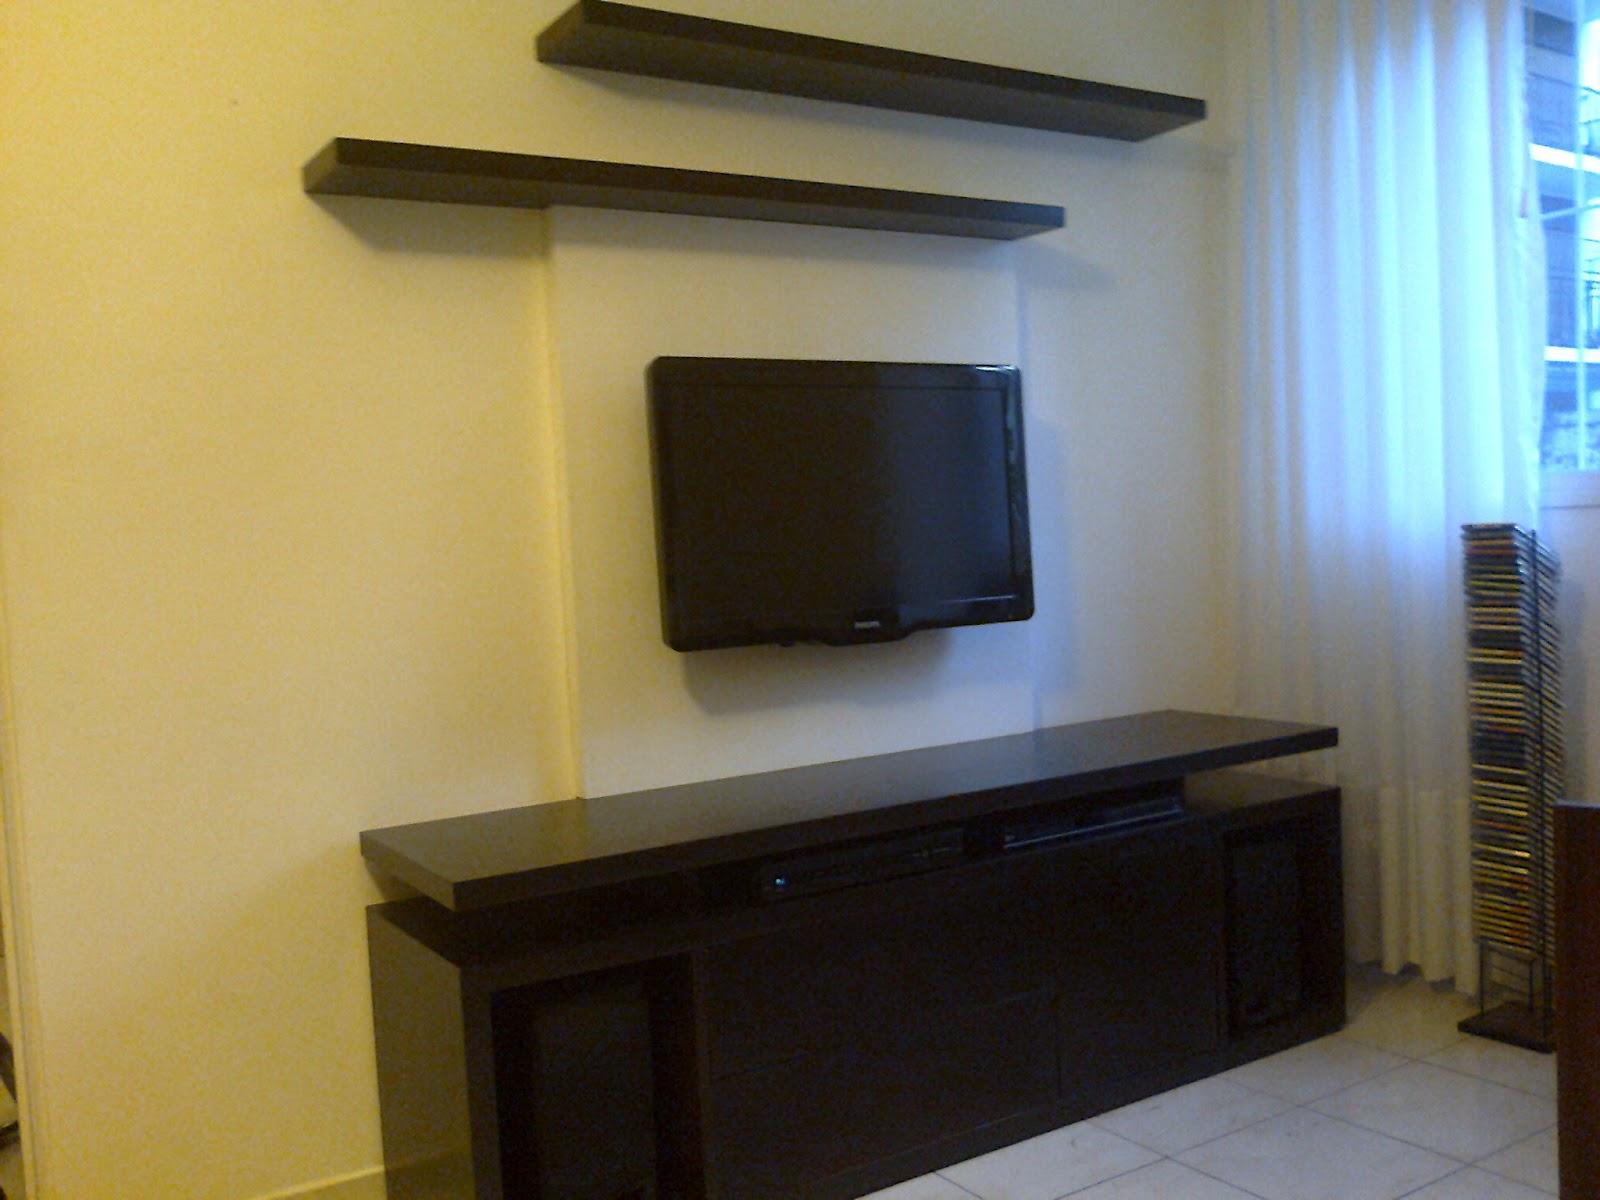 Benjamin mueble tv con tapa esconde cables - Muebles tapa tapa ...